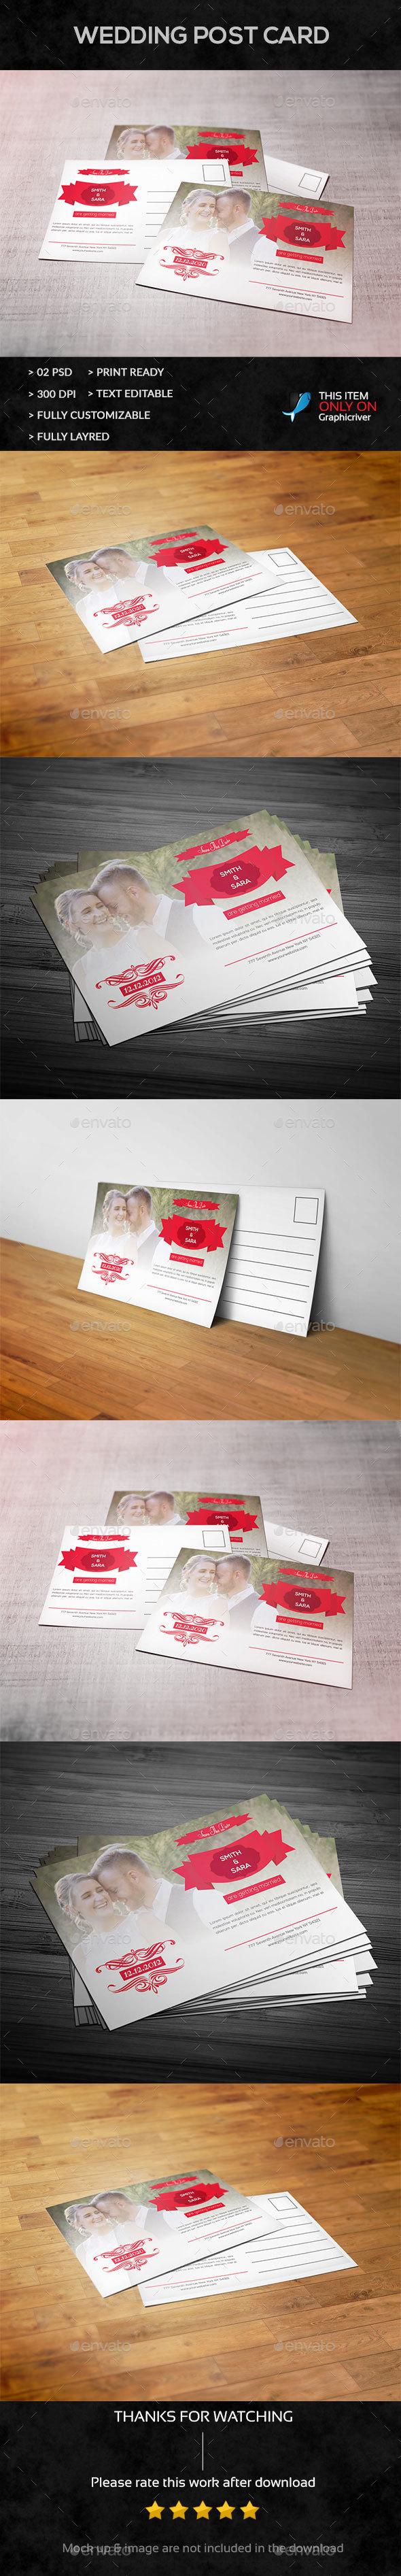 Wedding Post Card - Cards & Invites Print Templates